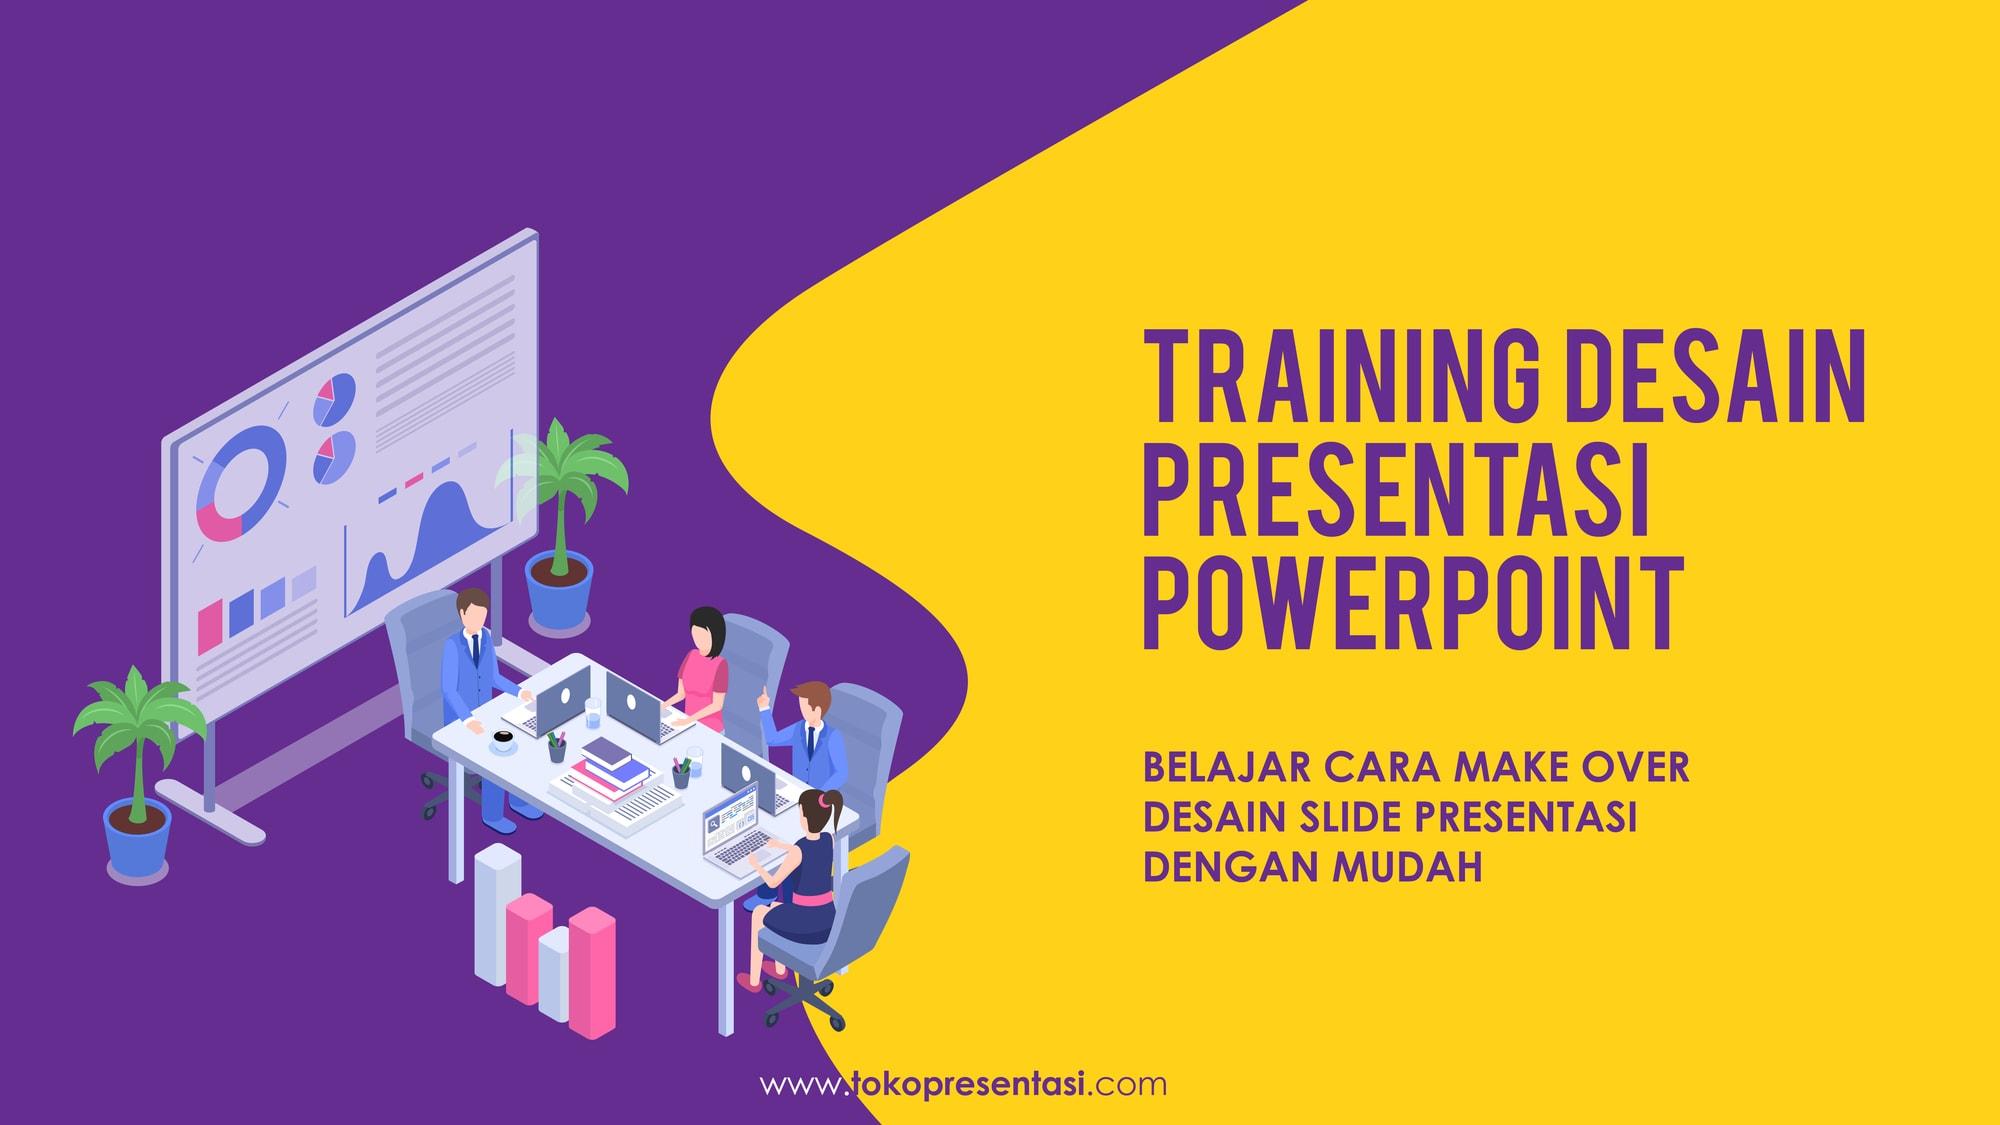 Pelatihan Desain Presentasi PowerPoint Mahkamah Agung Tokopresentasi